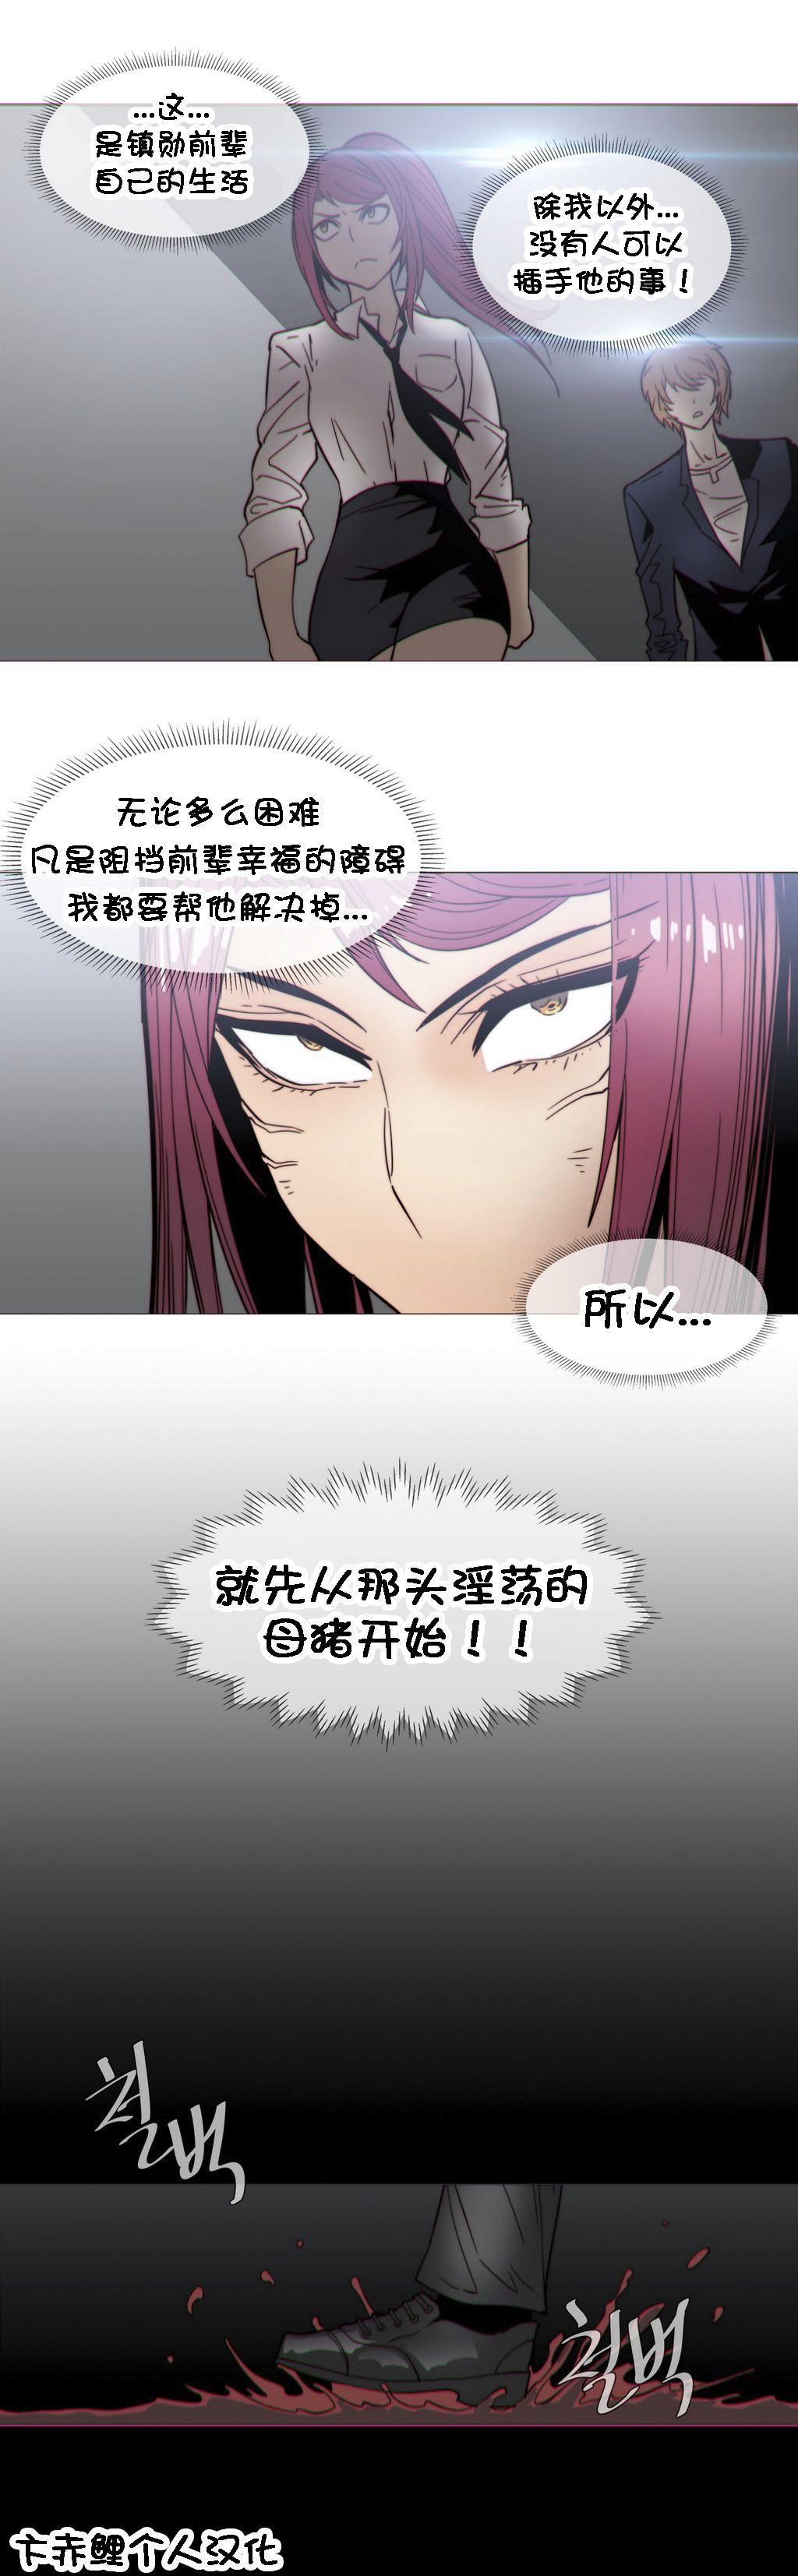 HouseHold Affairs 【卞赤鲤个人汉化】1~33话(持续更新中) 559